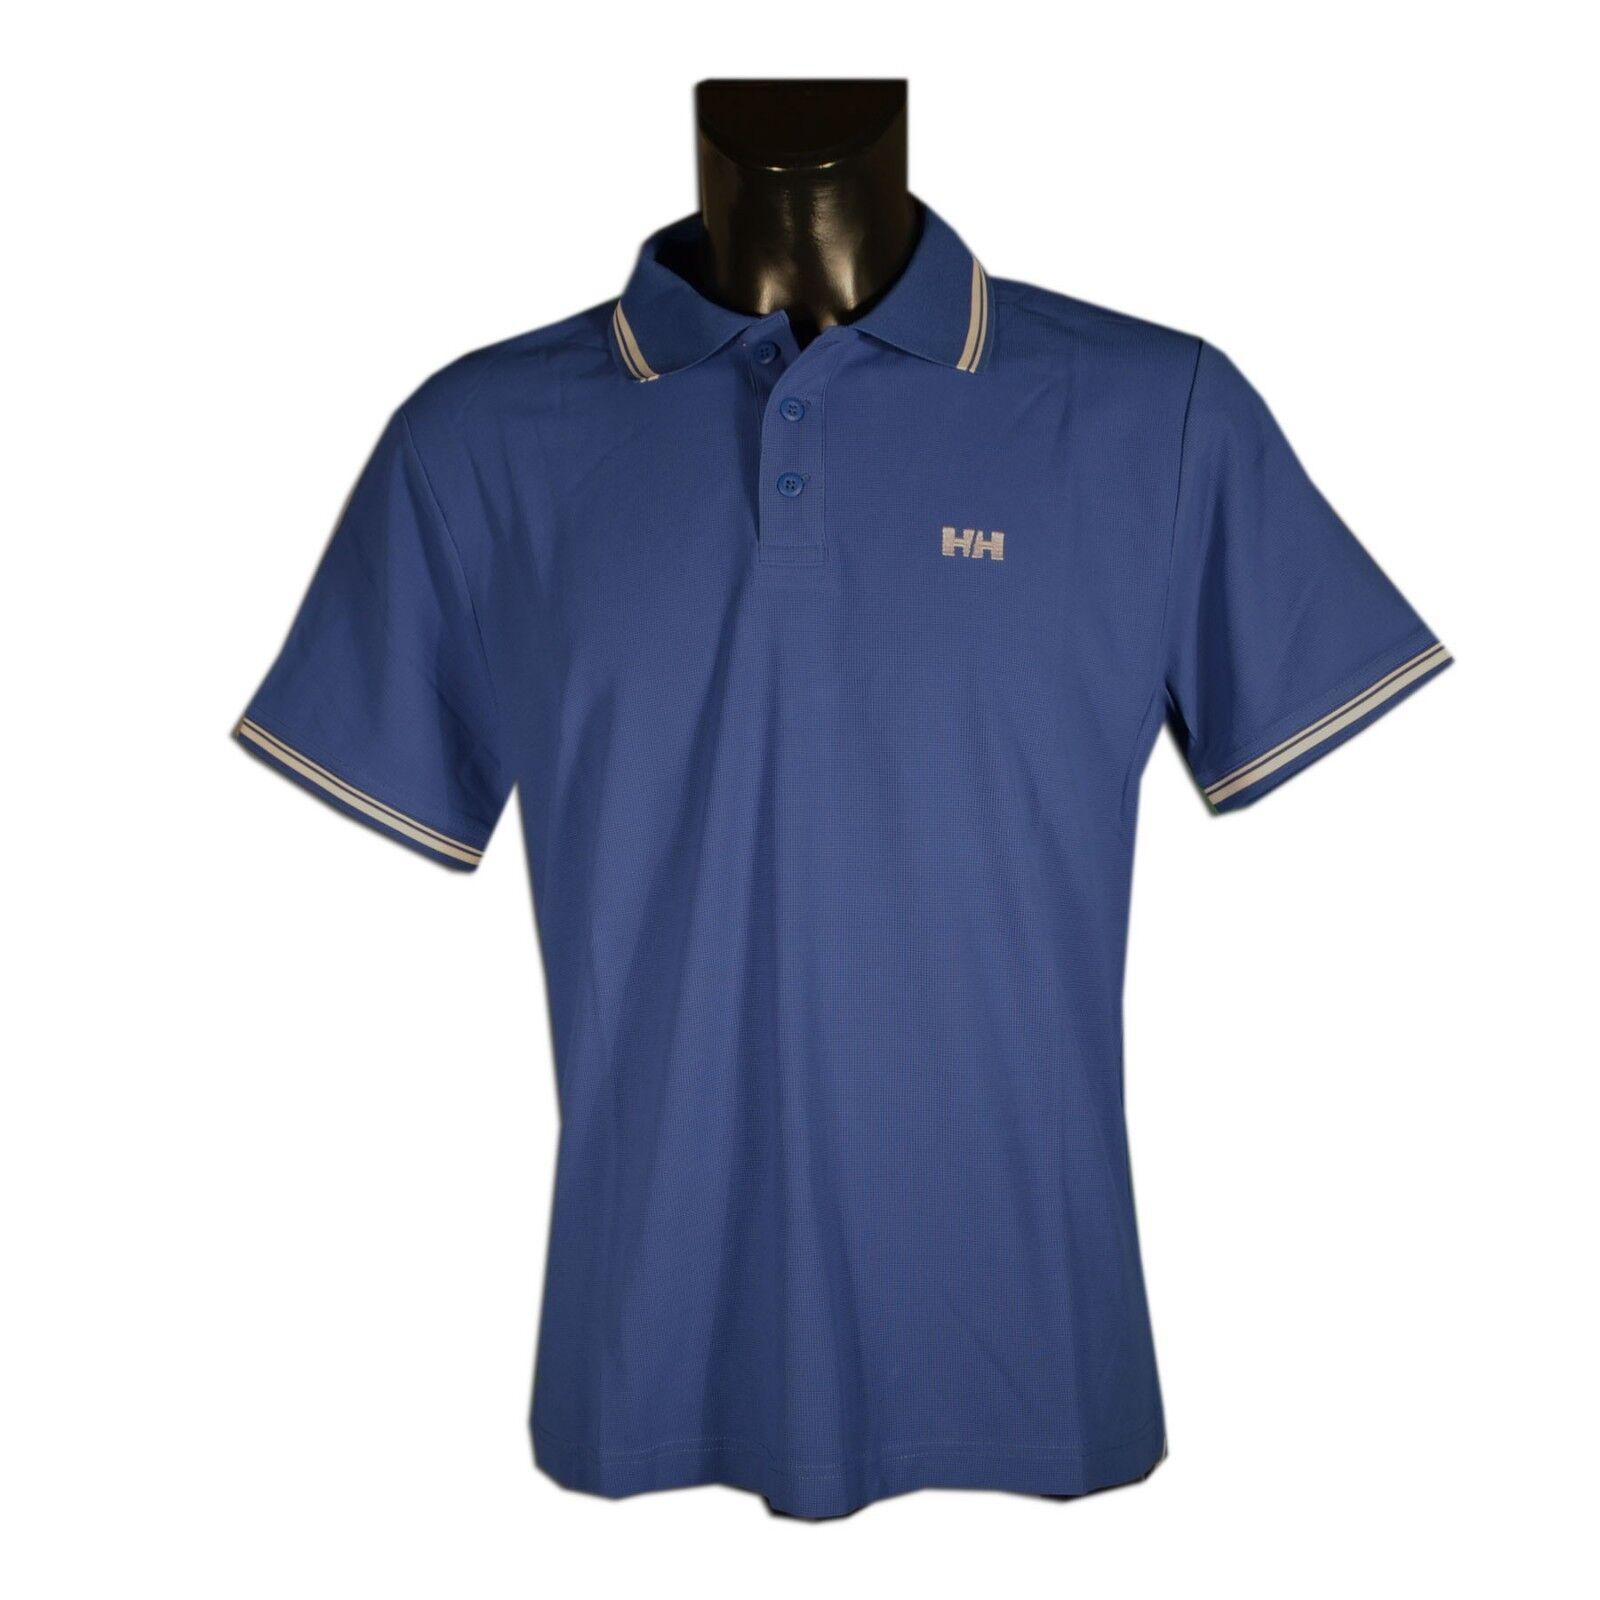 Helly Hansen - Polo -   KOS - 10038 - Polo Colore Olympian Blue -Taglia XXL 97c8d5